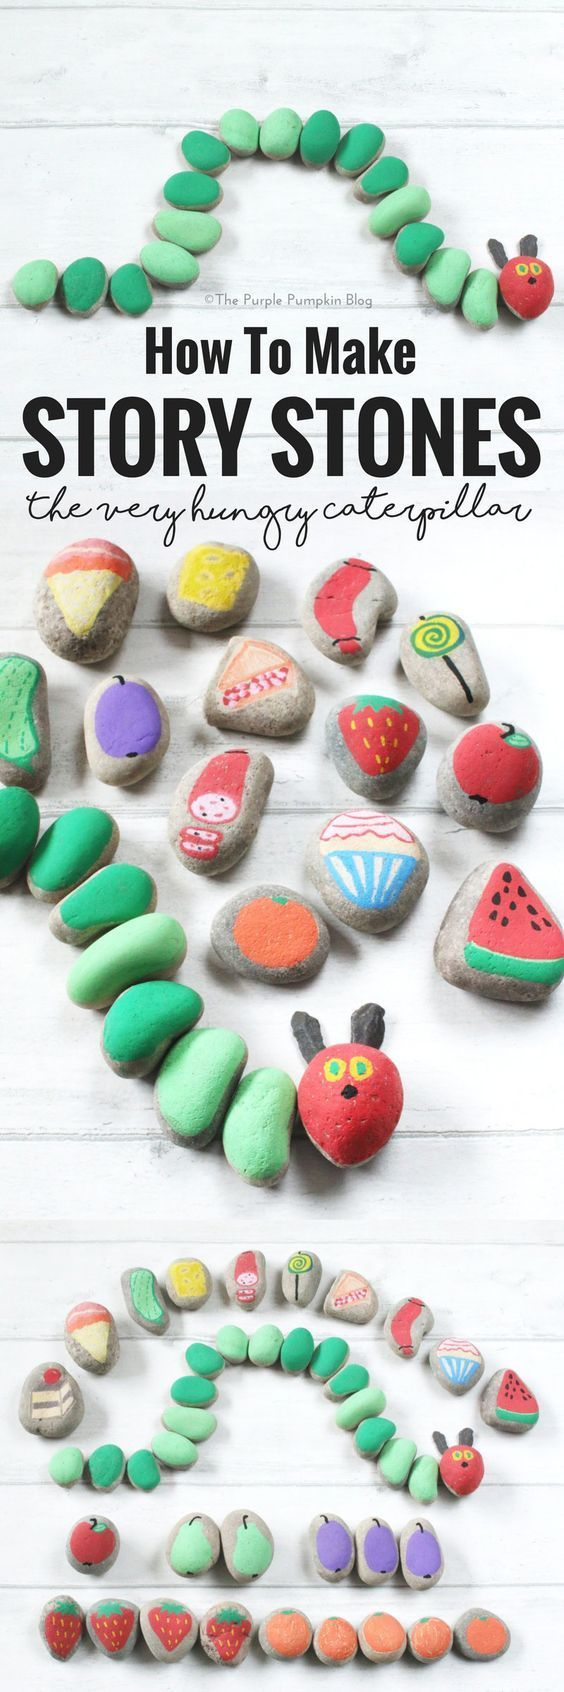 How To Make Story Stones with Uni-ball Posca Pens